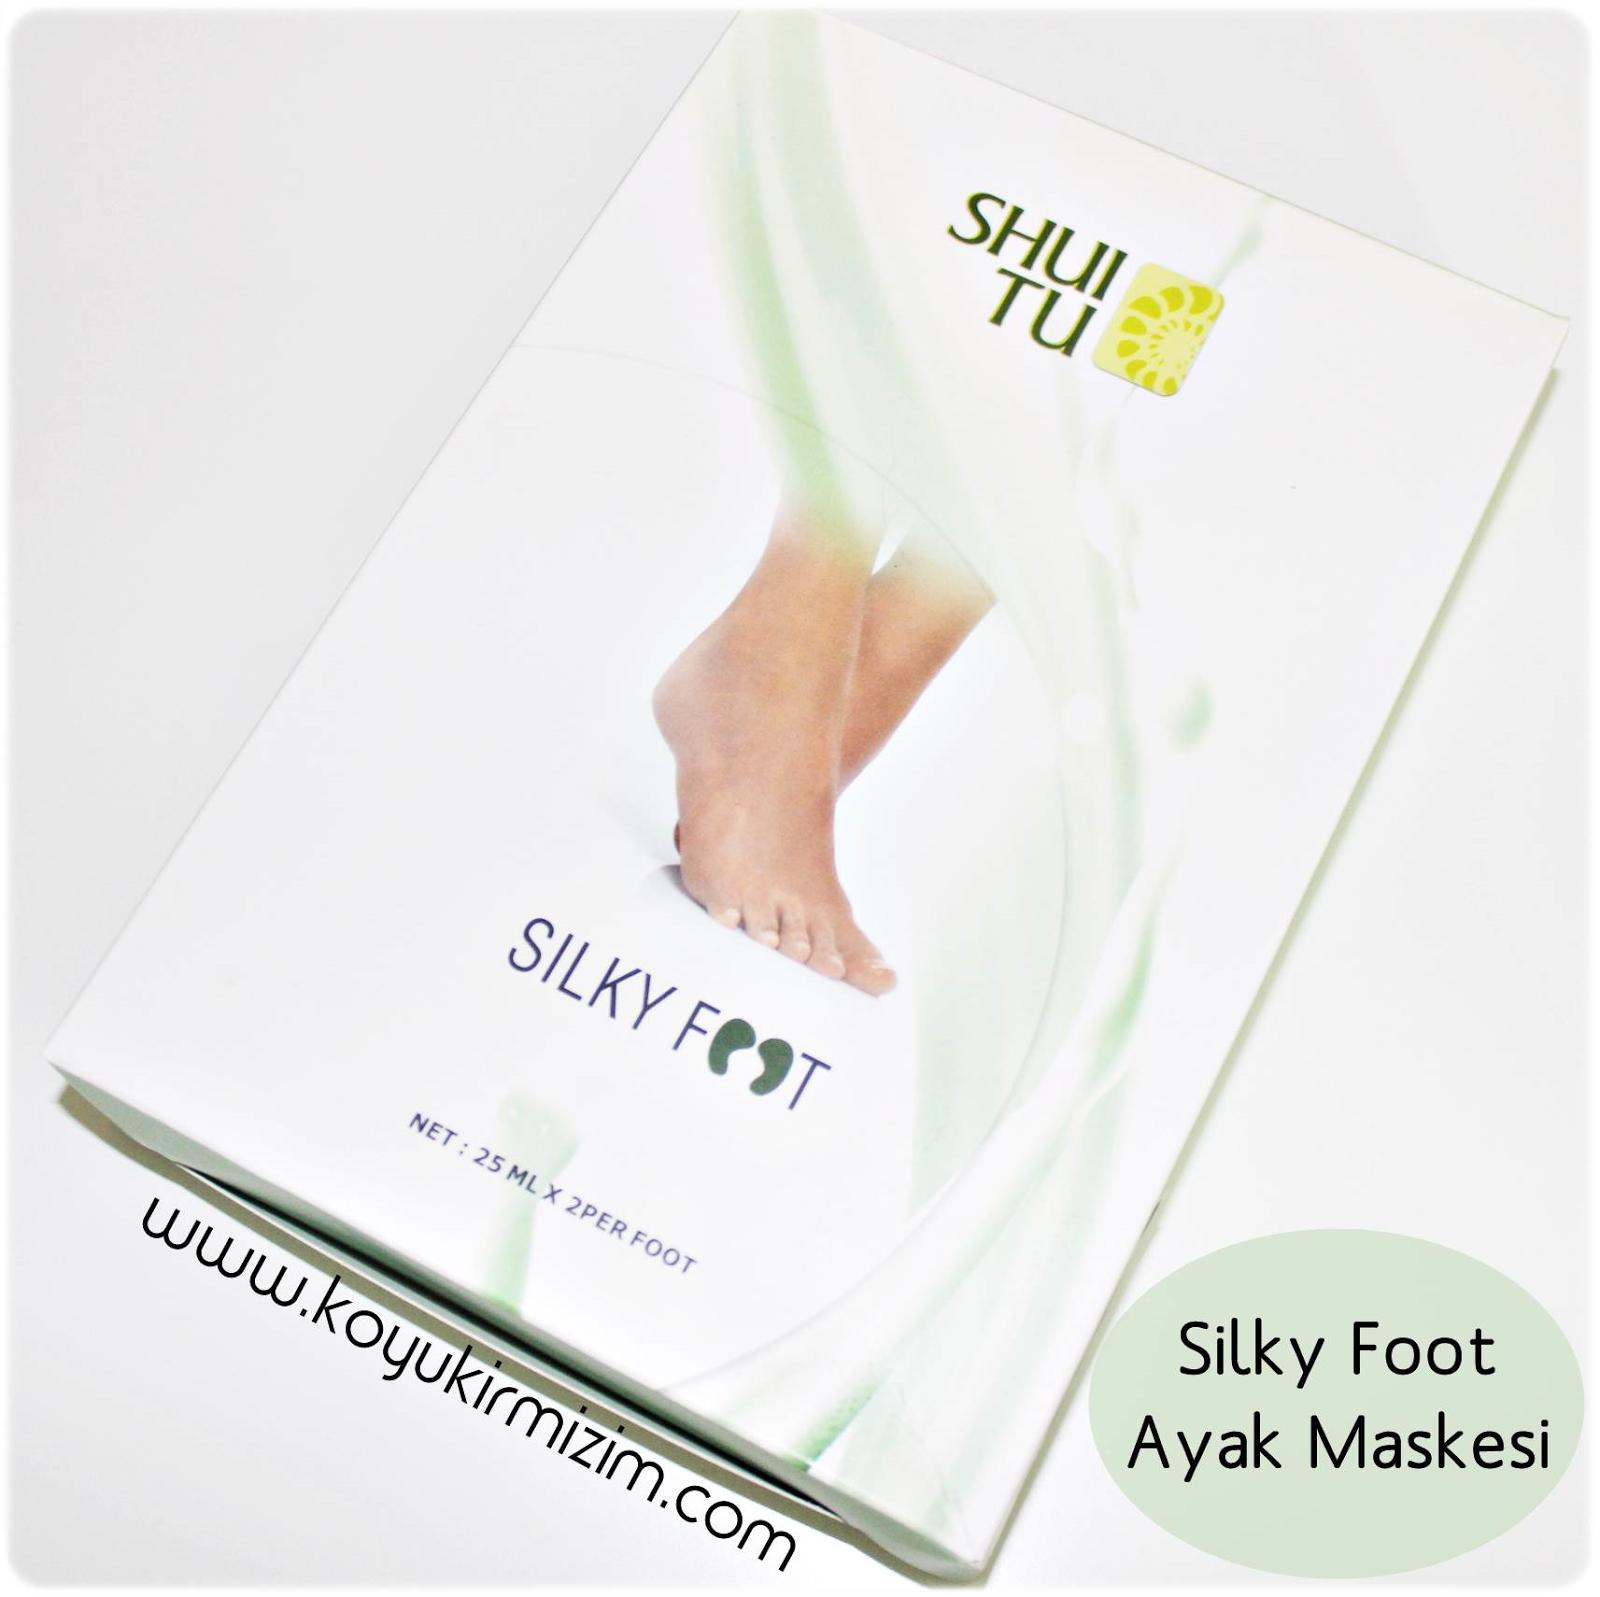 Silky Foot Ayak Maskesi